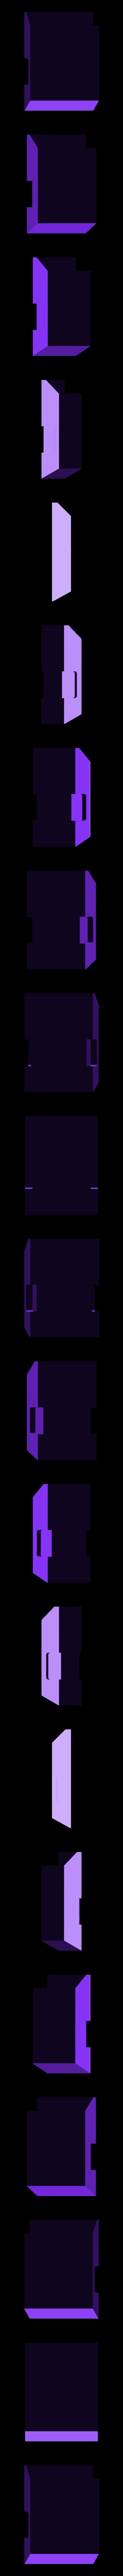 bracket_proef.stl Download free STL file Universal Smartphone Bracket for camera stand • 3D printing template, Job